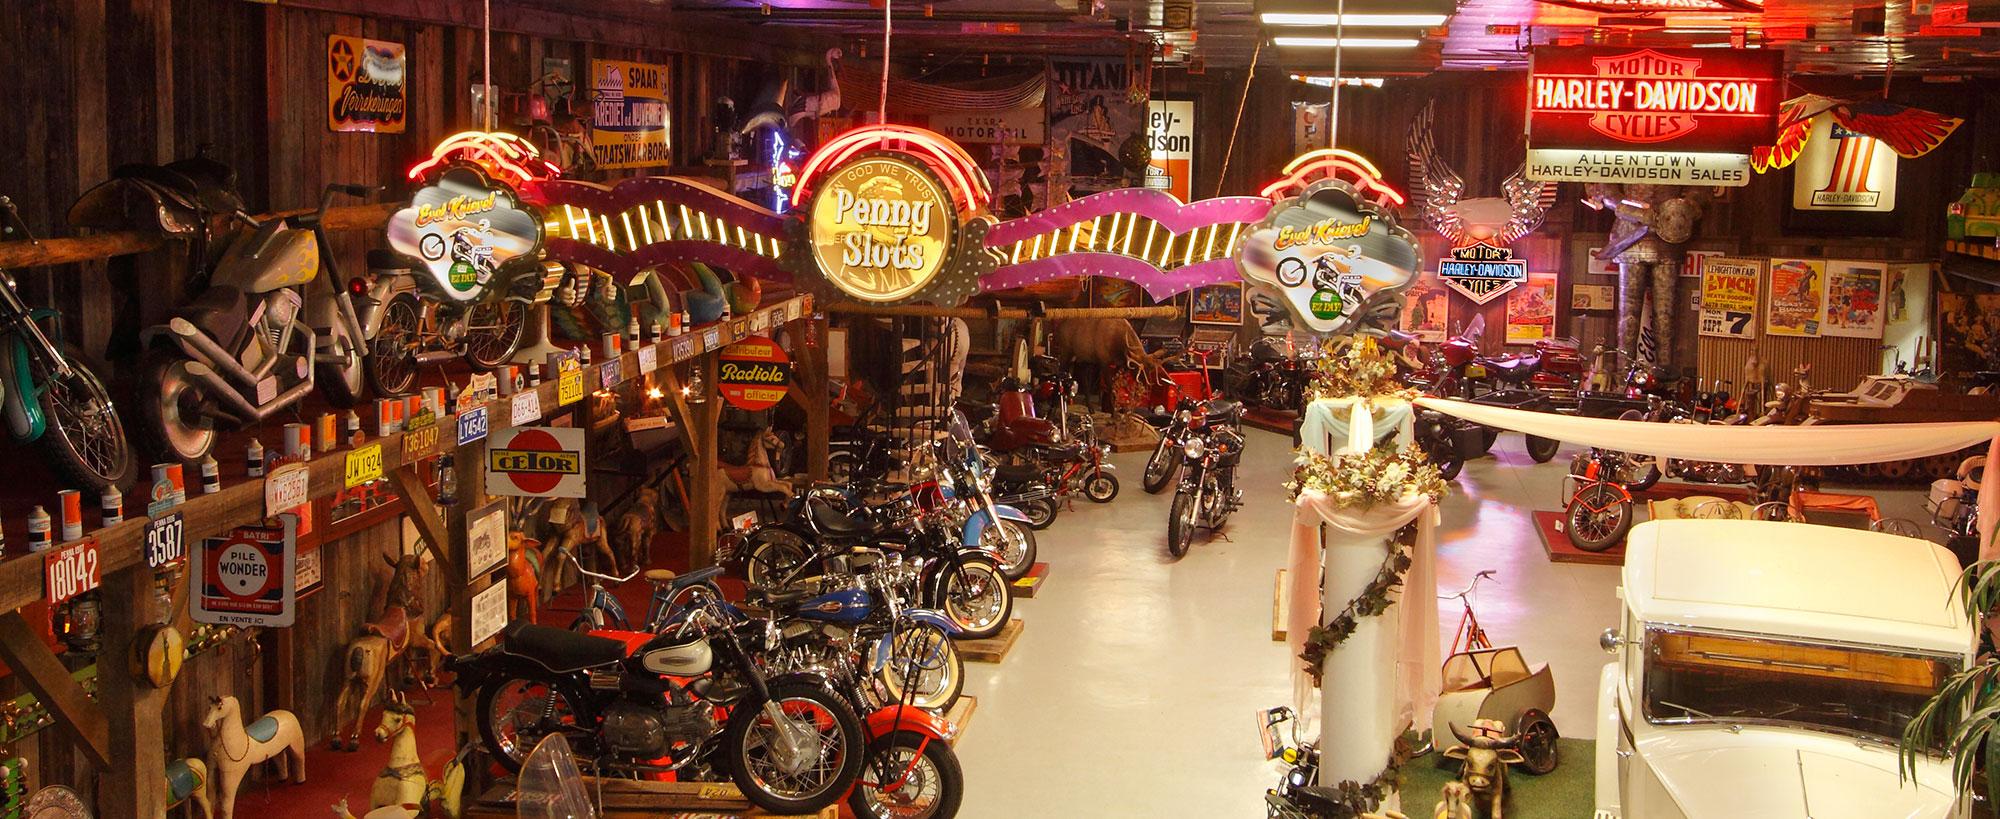 Bills Custom Cycles - Original and Reproduction Motorcycle